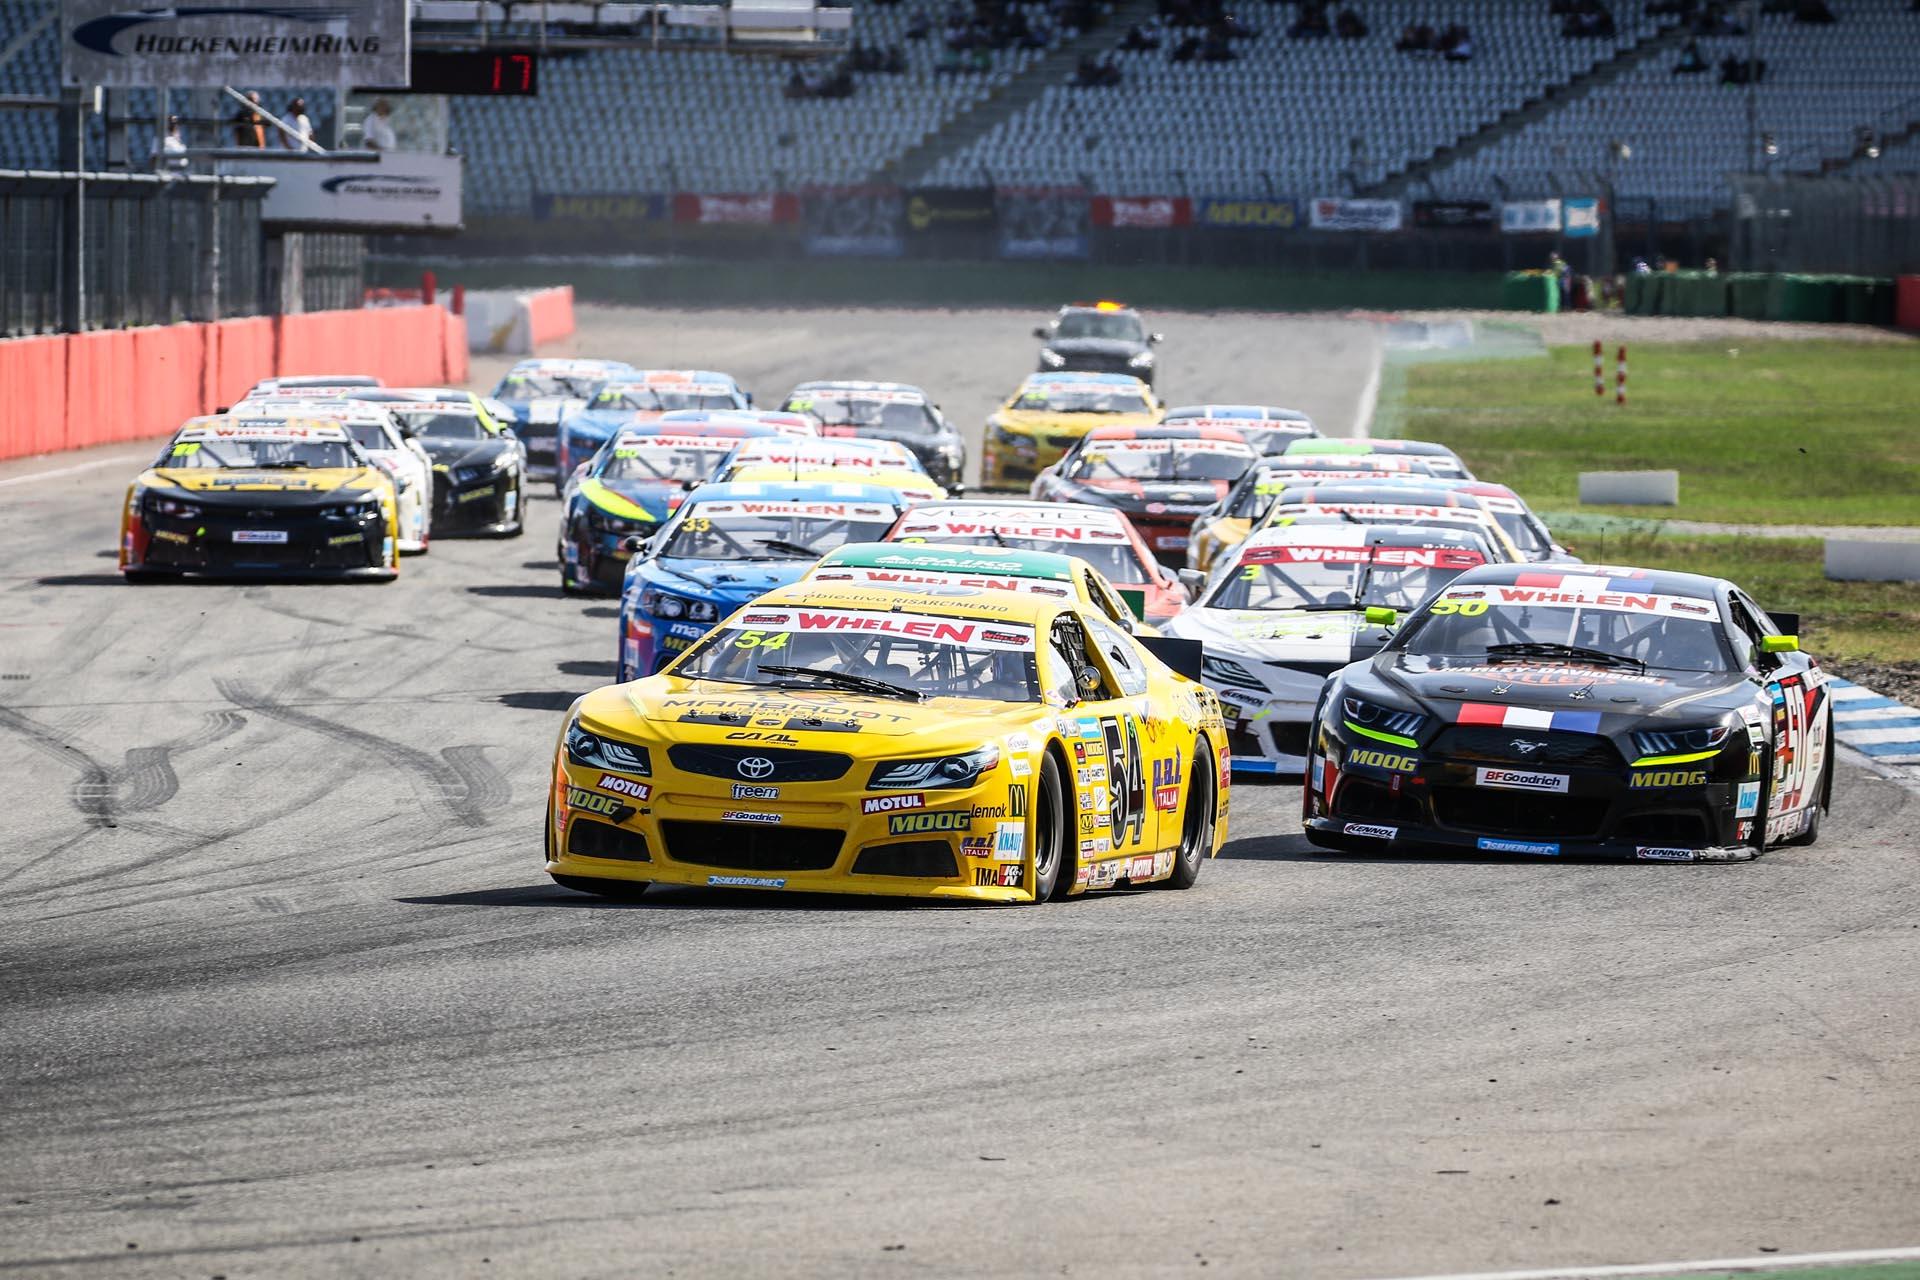 photo by Euro NASCAR